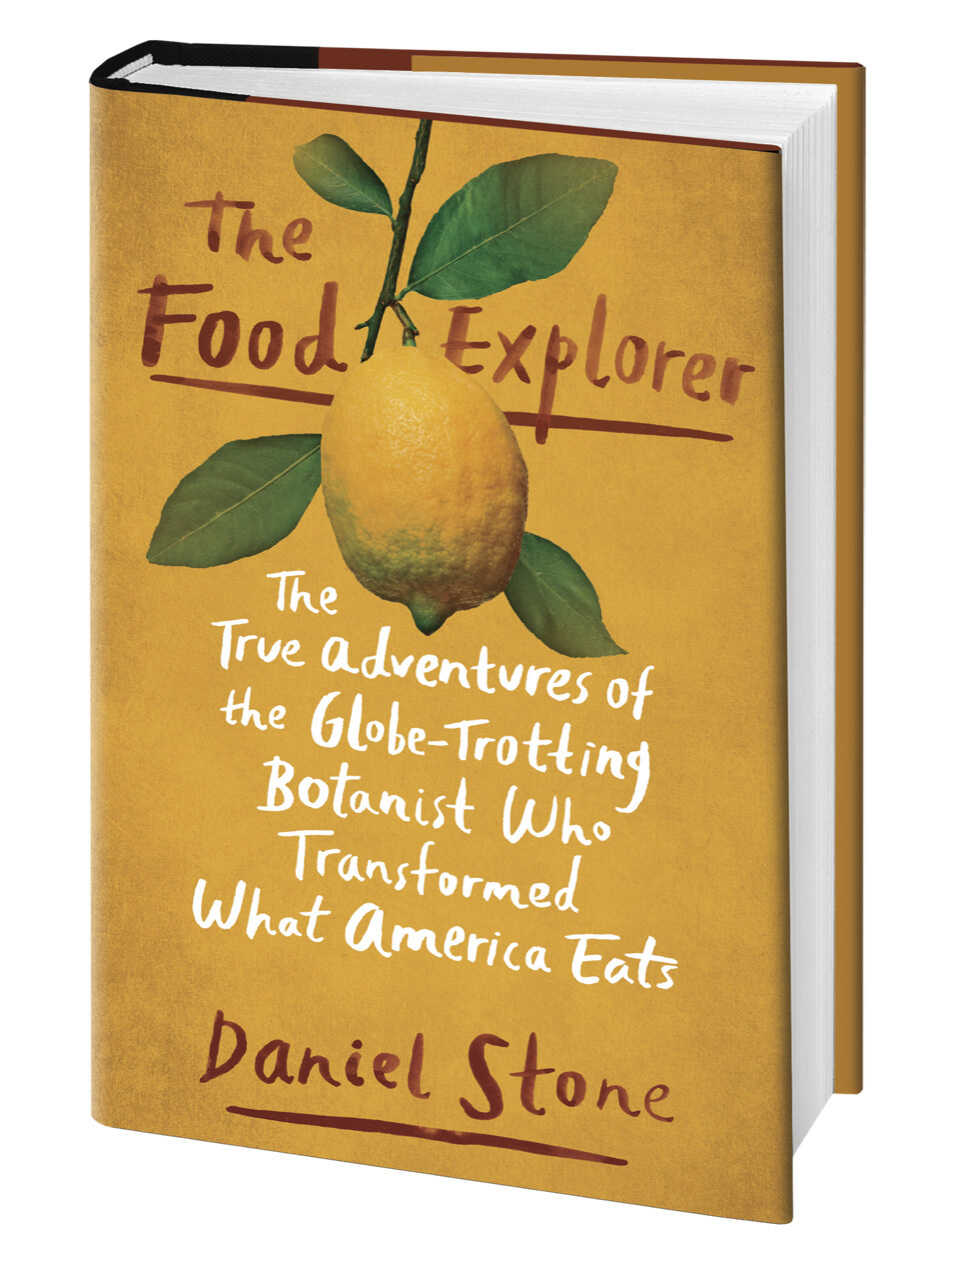 The Food Explorer book